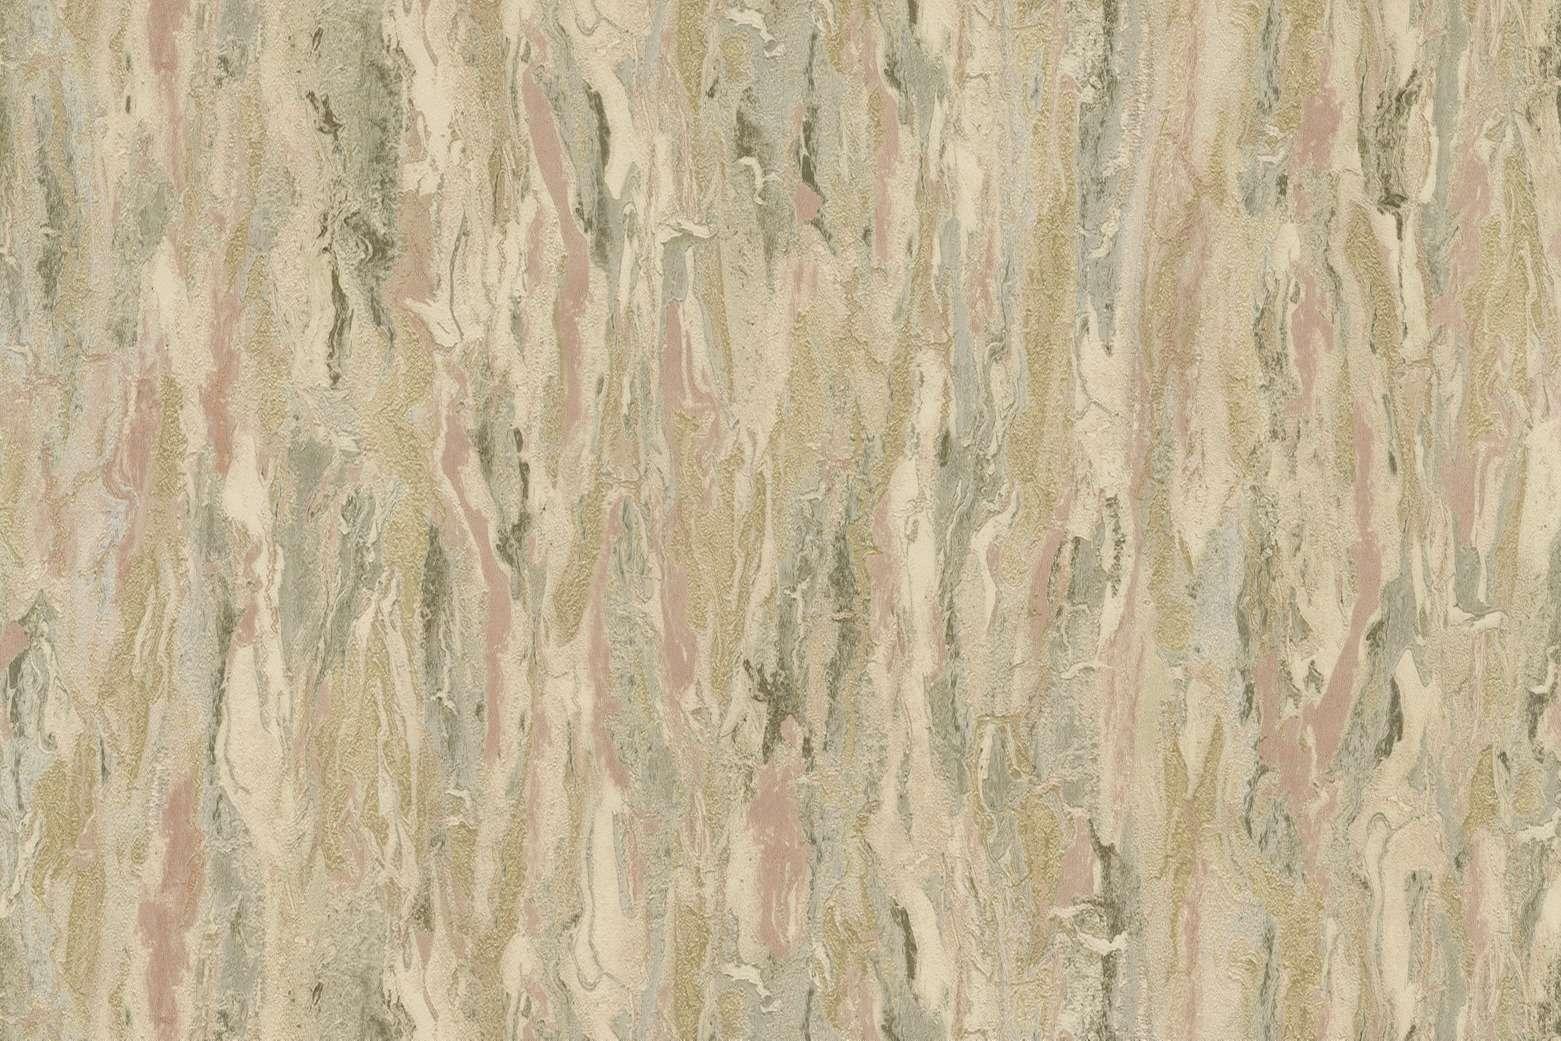 Обои Decori & Decori Carrara 2 — Декори Каррара 2 83695